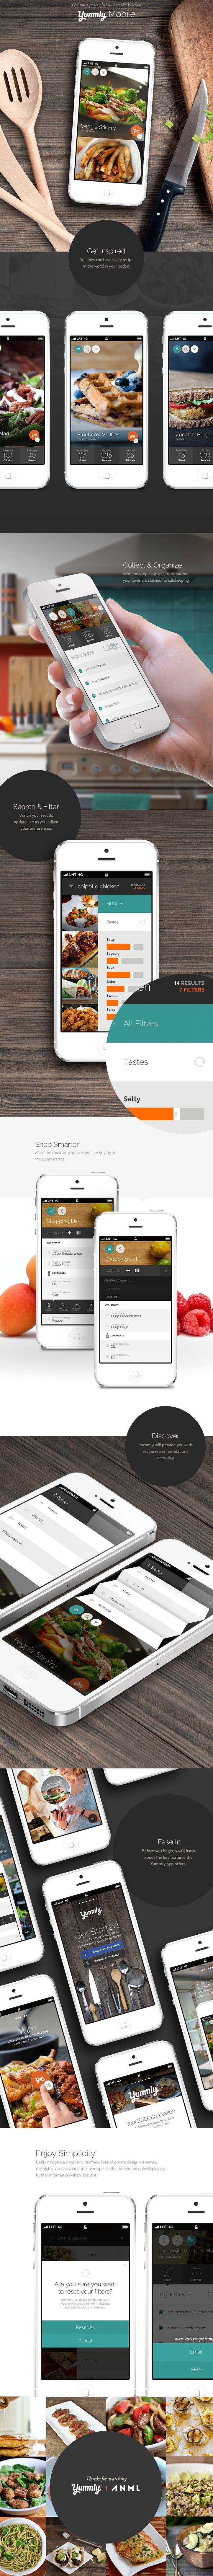 Inspiration mobile #1 : des applications et du web design ! - Yummly Mobile